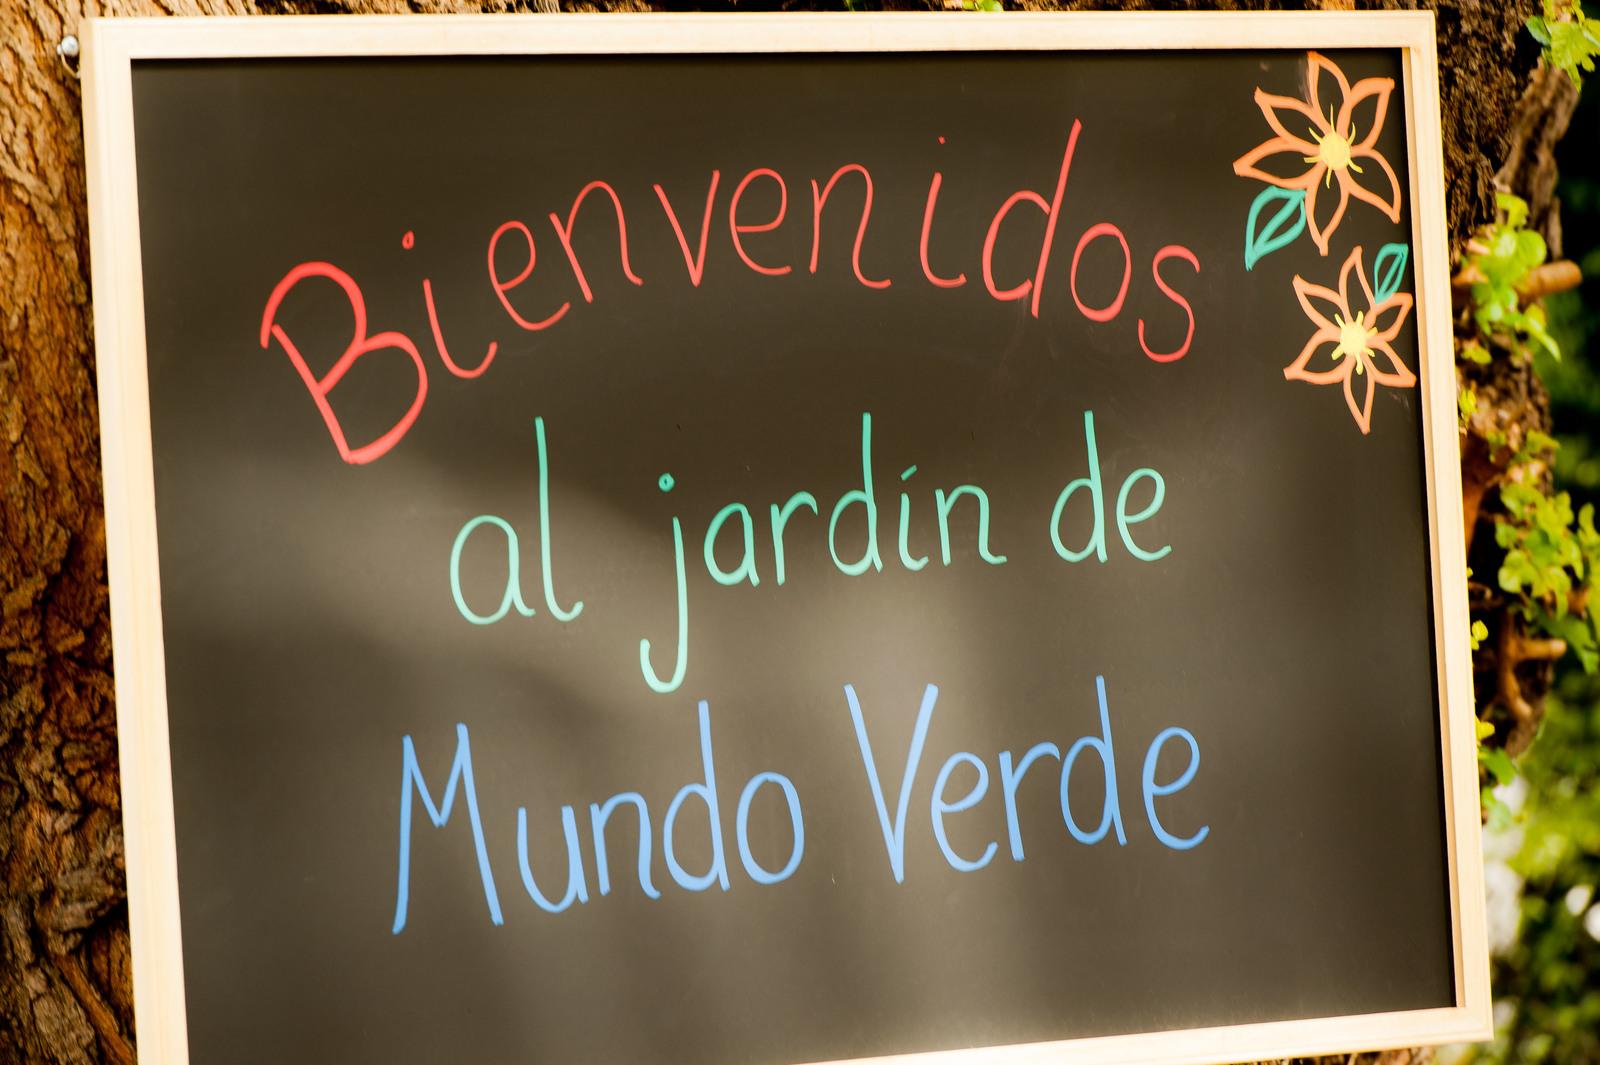 Office of the Deputy Administrator - Mundo Verde - Green Ribbon School [412-APD-1338-2013-04-22_GreenRibbonSchool_038.jpg]